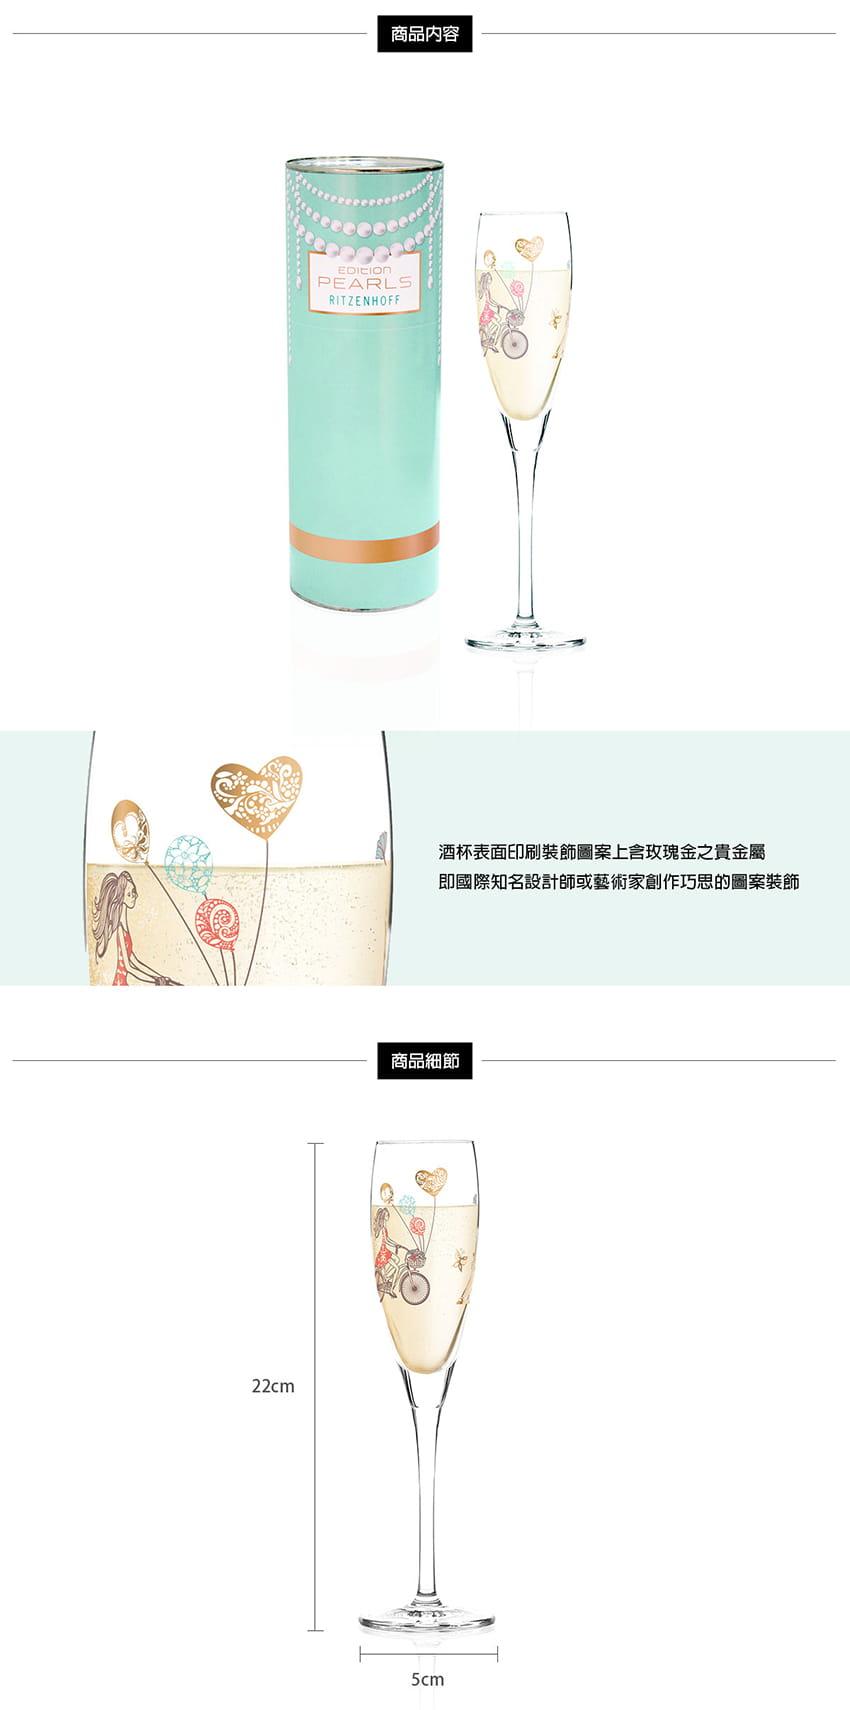 德國 RITZENHOFF PEARLS EDITION 珍珠氣泡酒杯-夢幻女孩